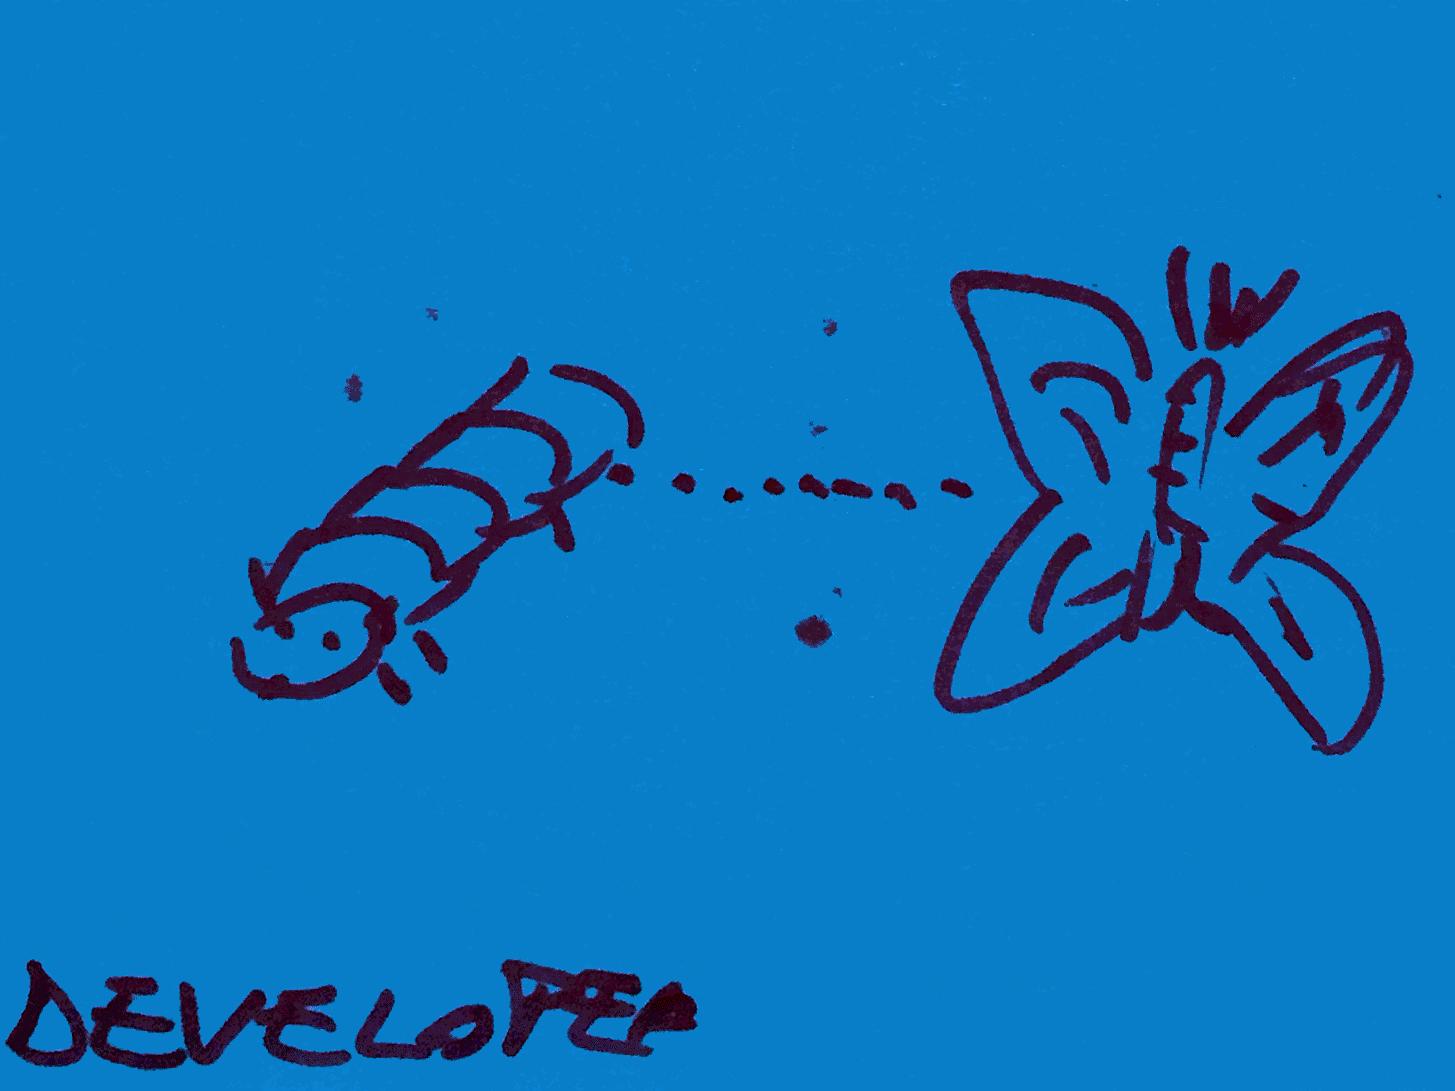 Developer StrengthsFinder Singapore Caterpillar to Butterfly